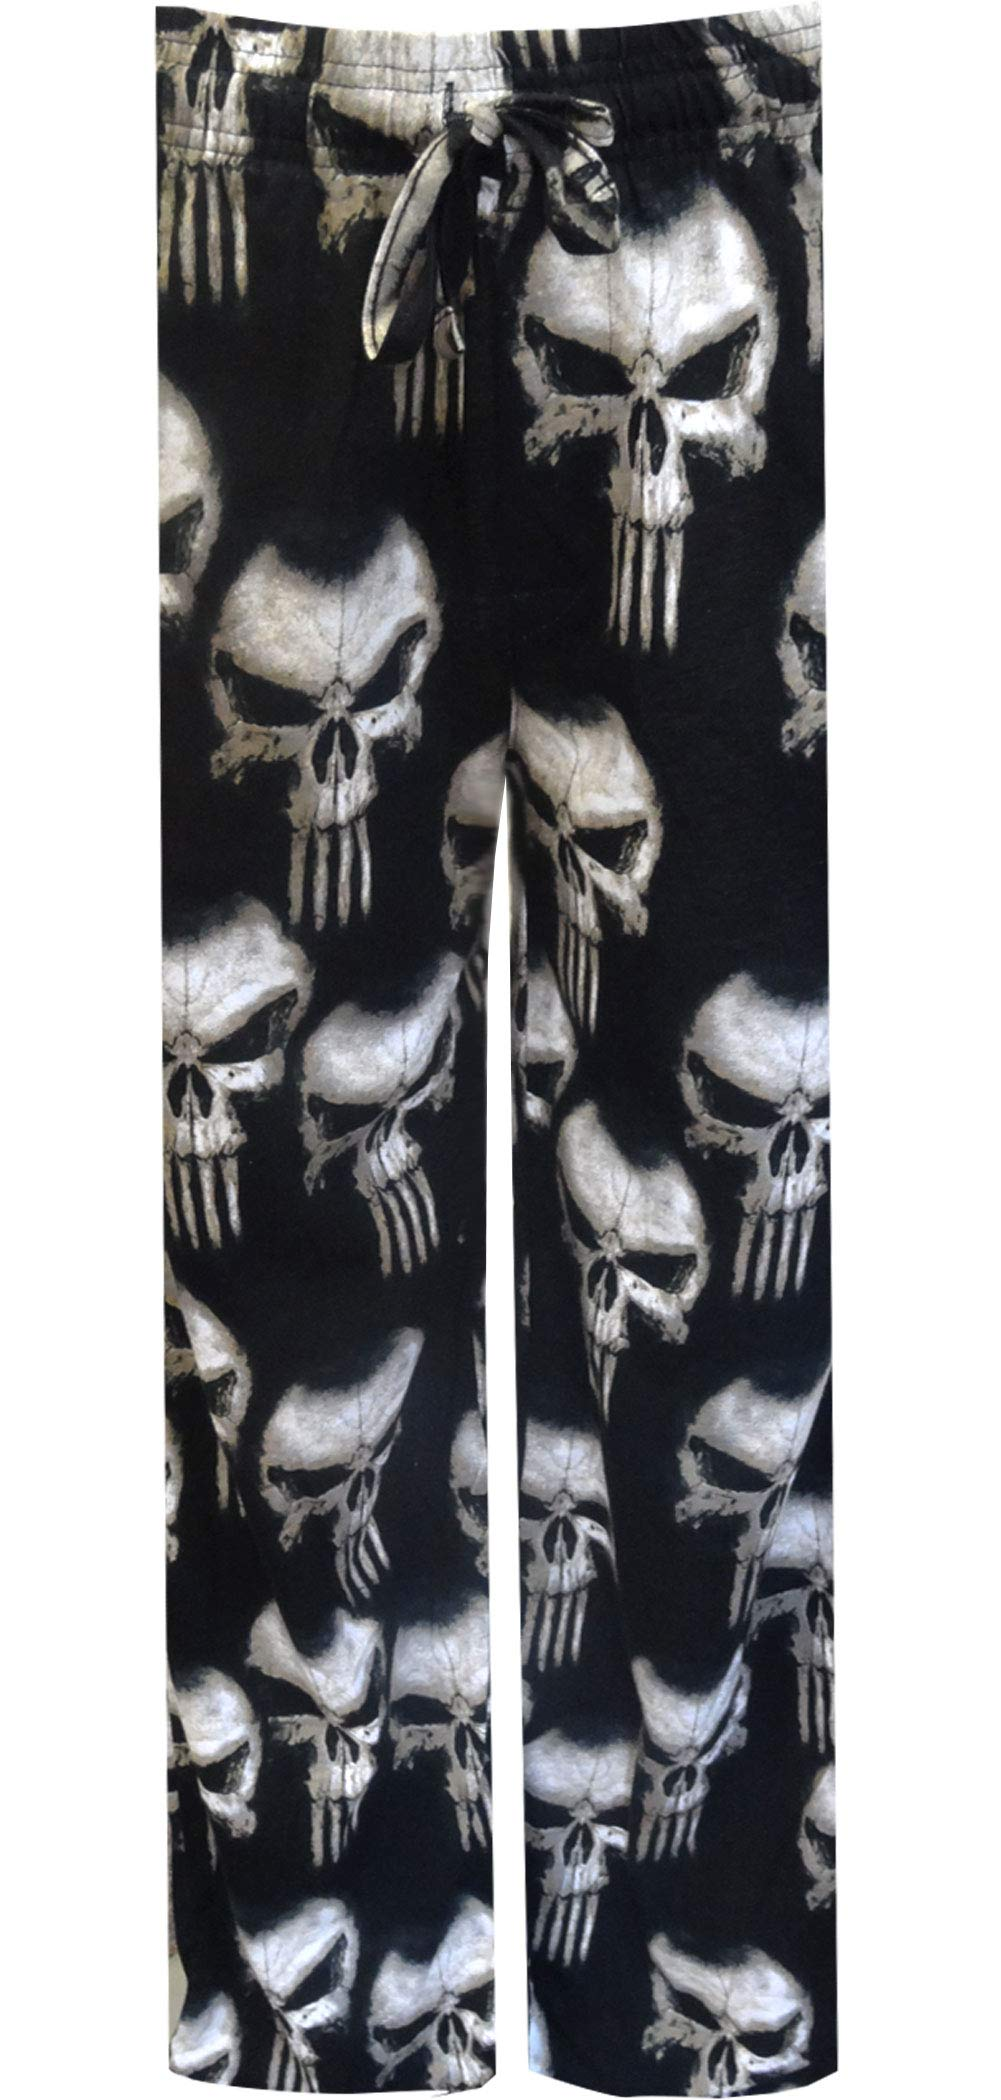 Marvel Comics The Punisher White Skull Print Mens Loungewear Lounge Pants Gift